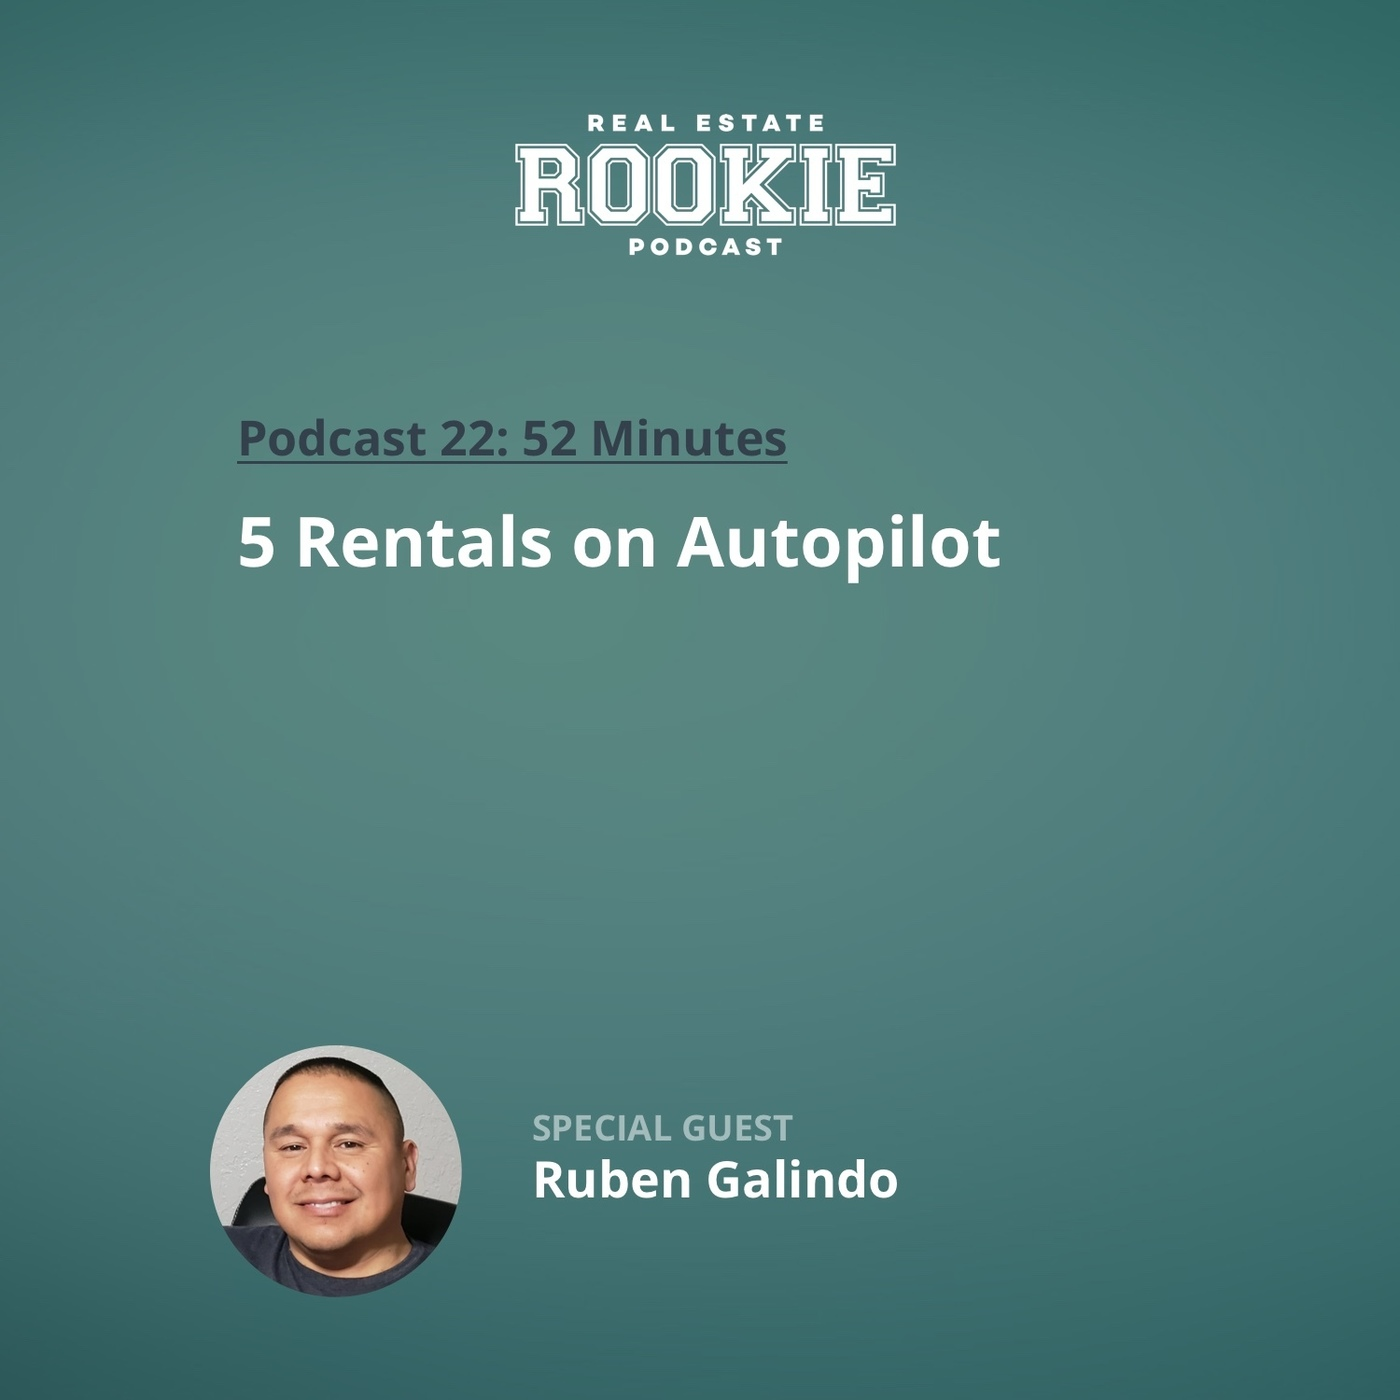 5 Rentals on Autopilot with Full-Time Highway Patrolman Ruben Galindo